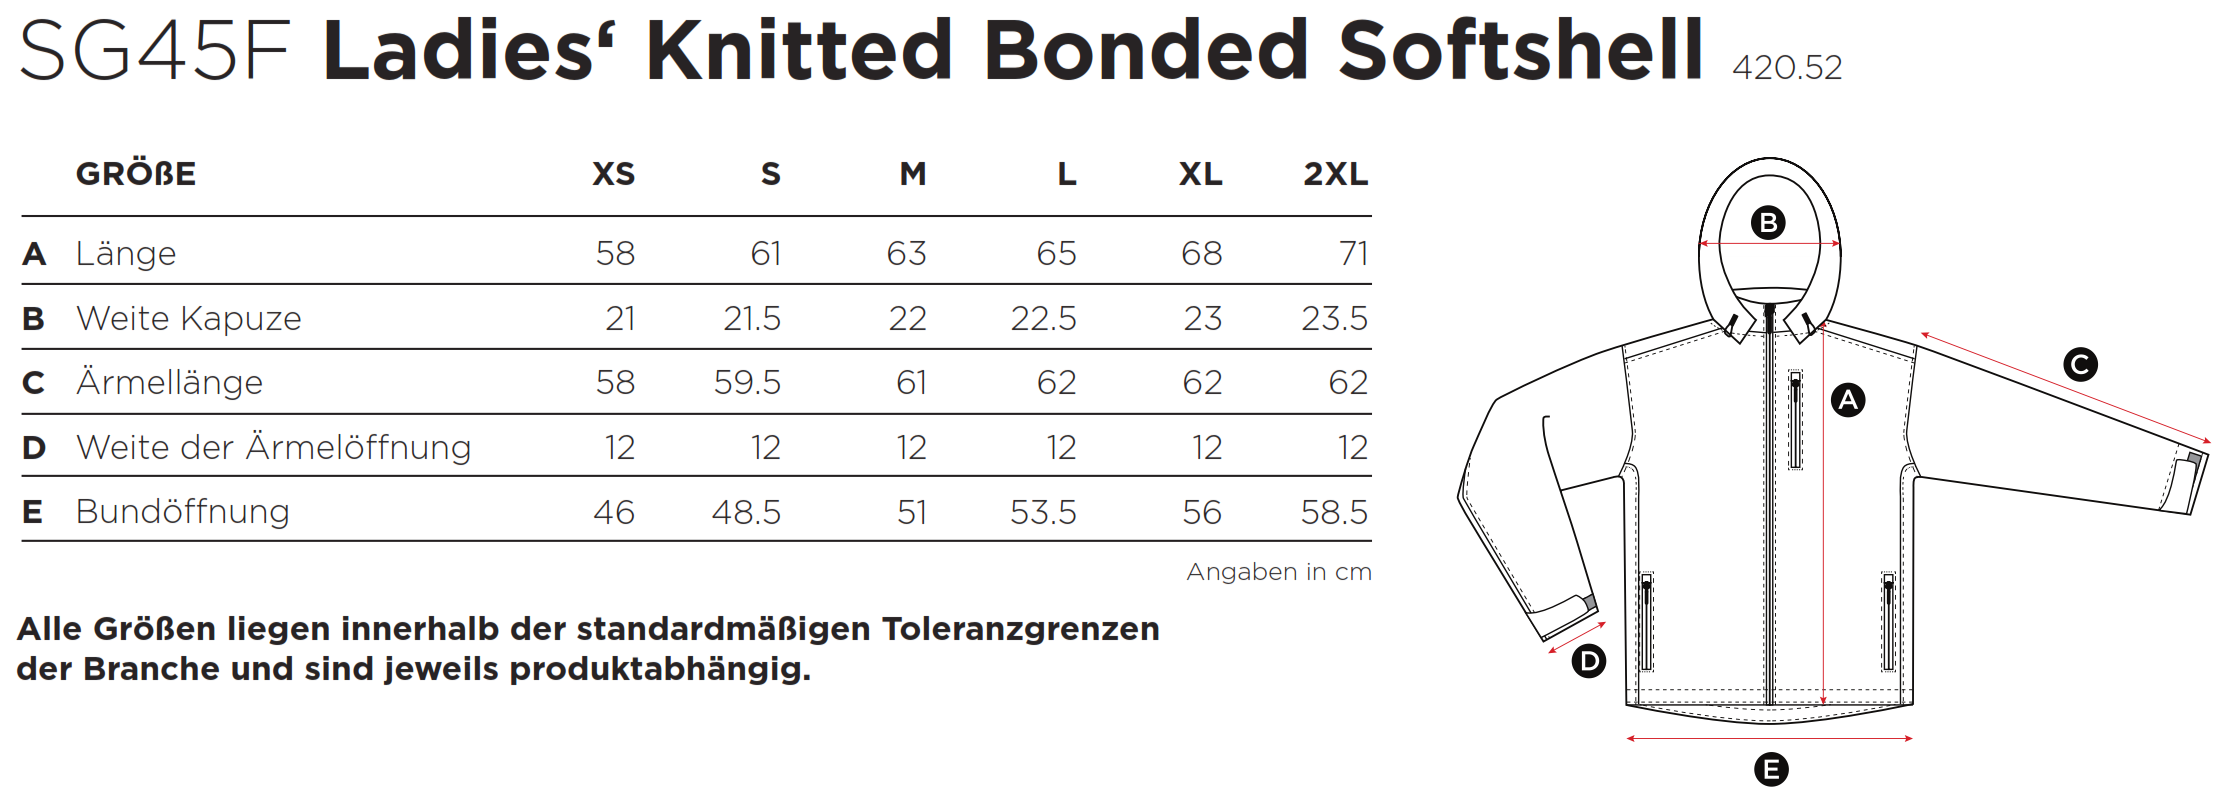 SG: Ladies Knitted Bonded Softshell SG45F